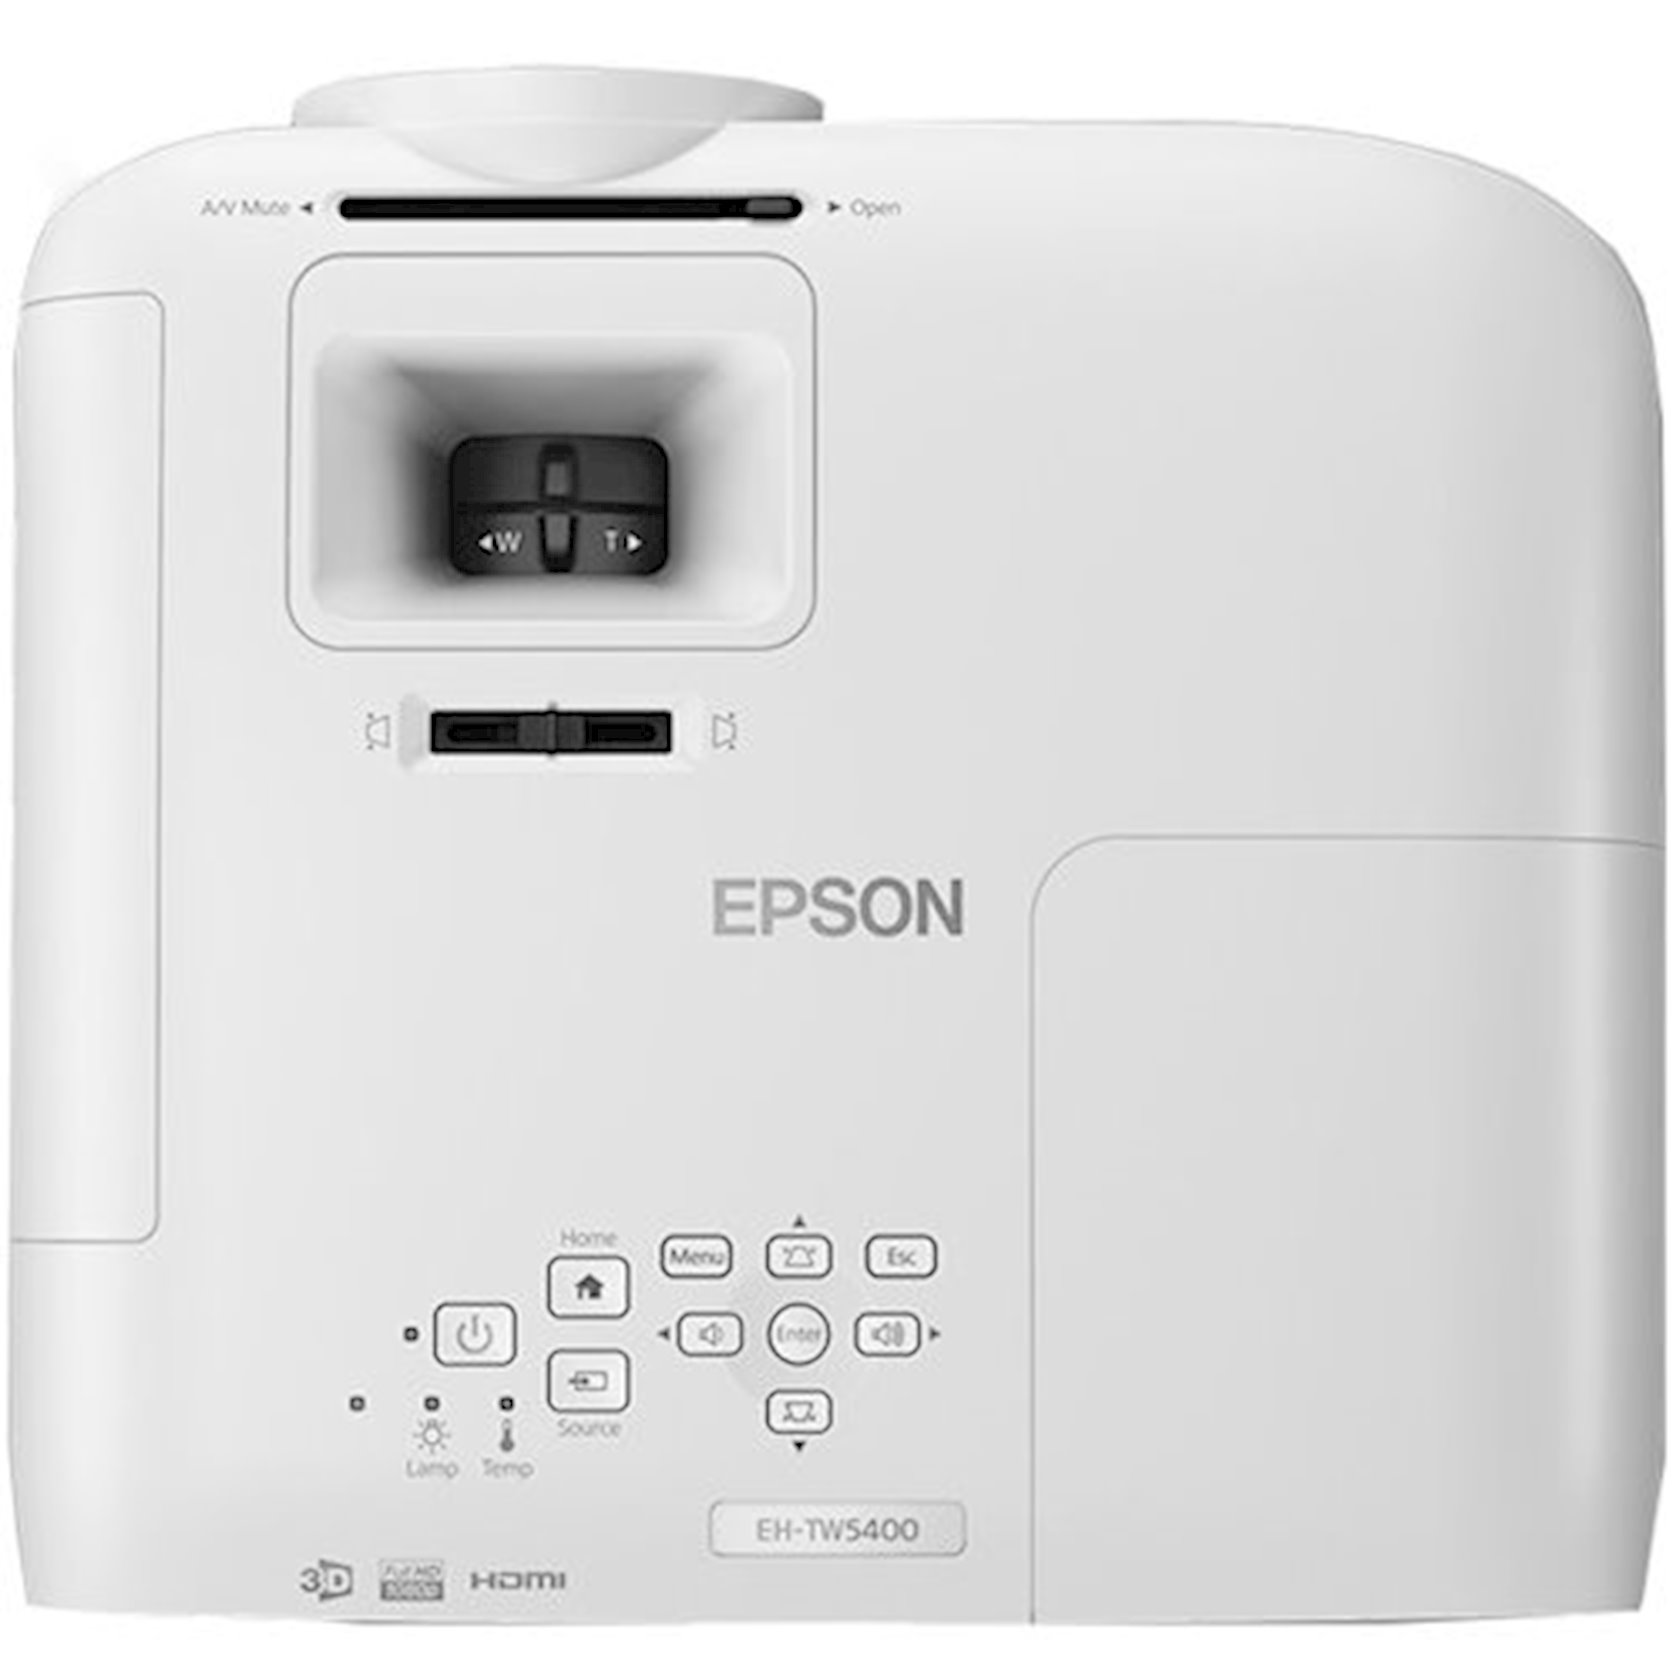 Proyektor EPSON EH-TW5400 (V11H850040-N)